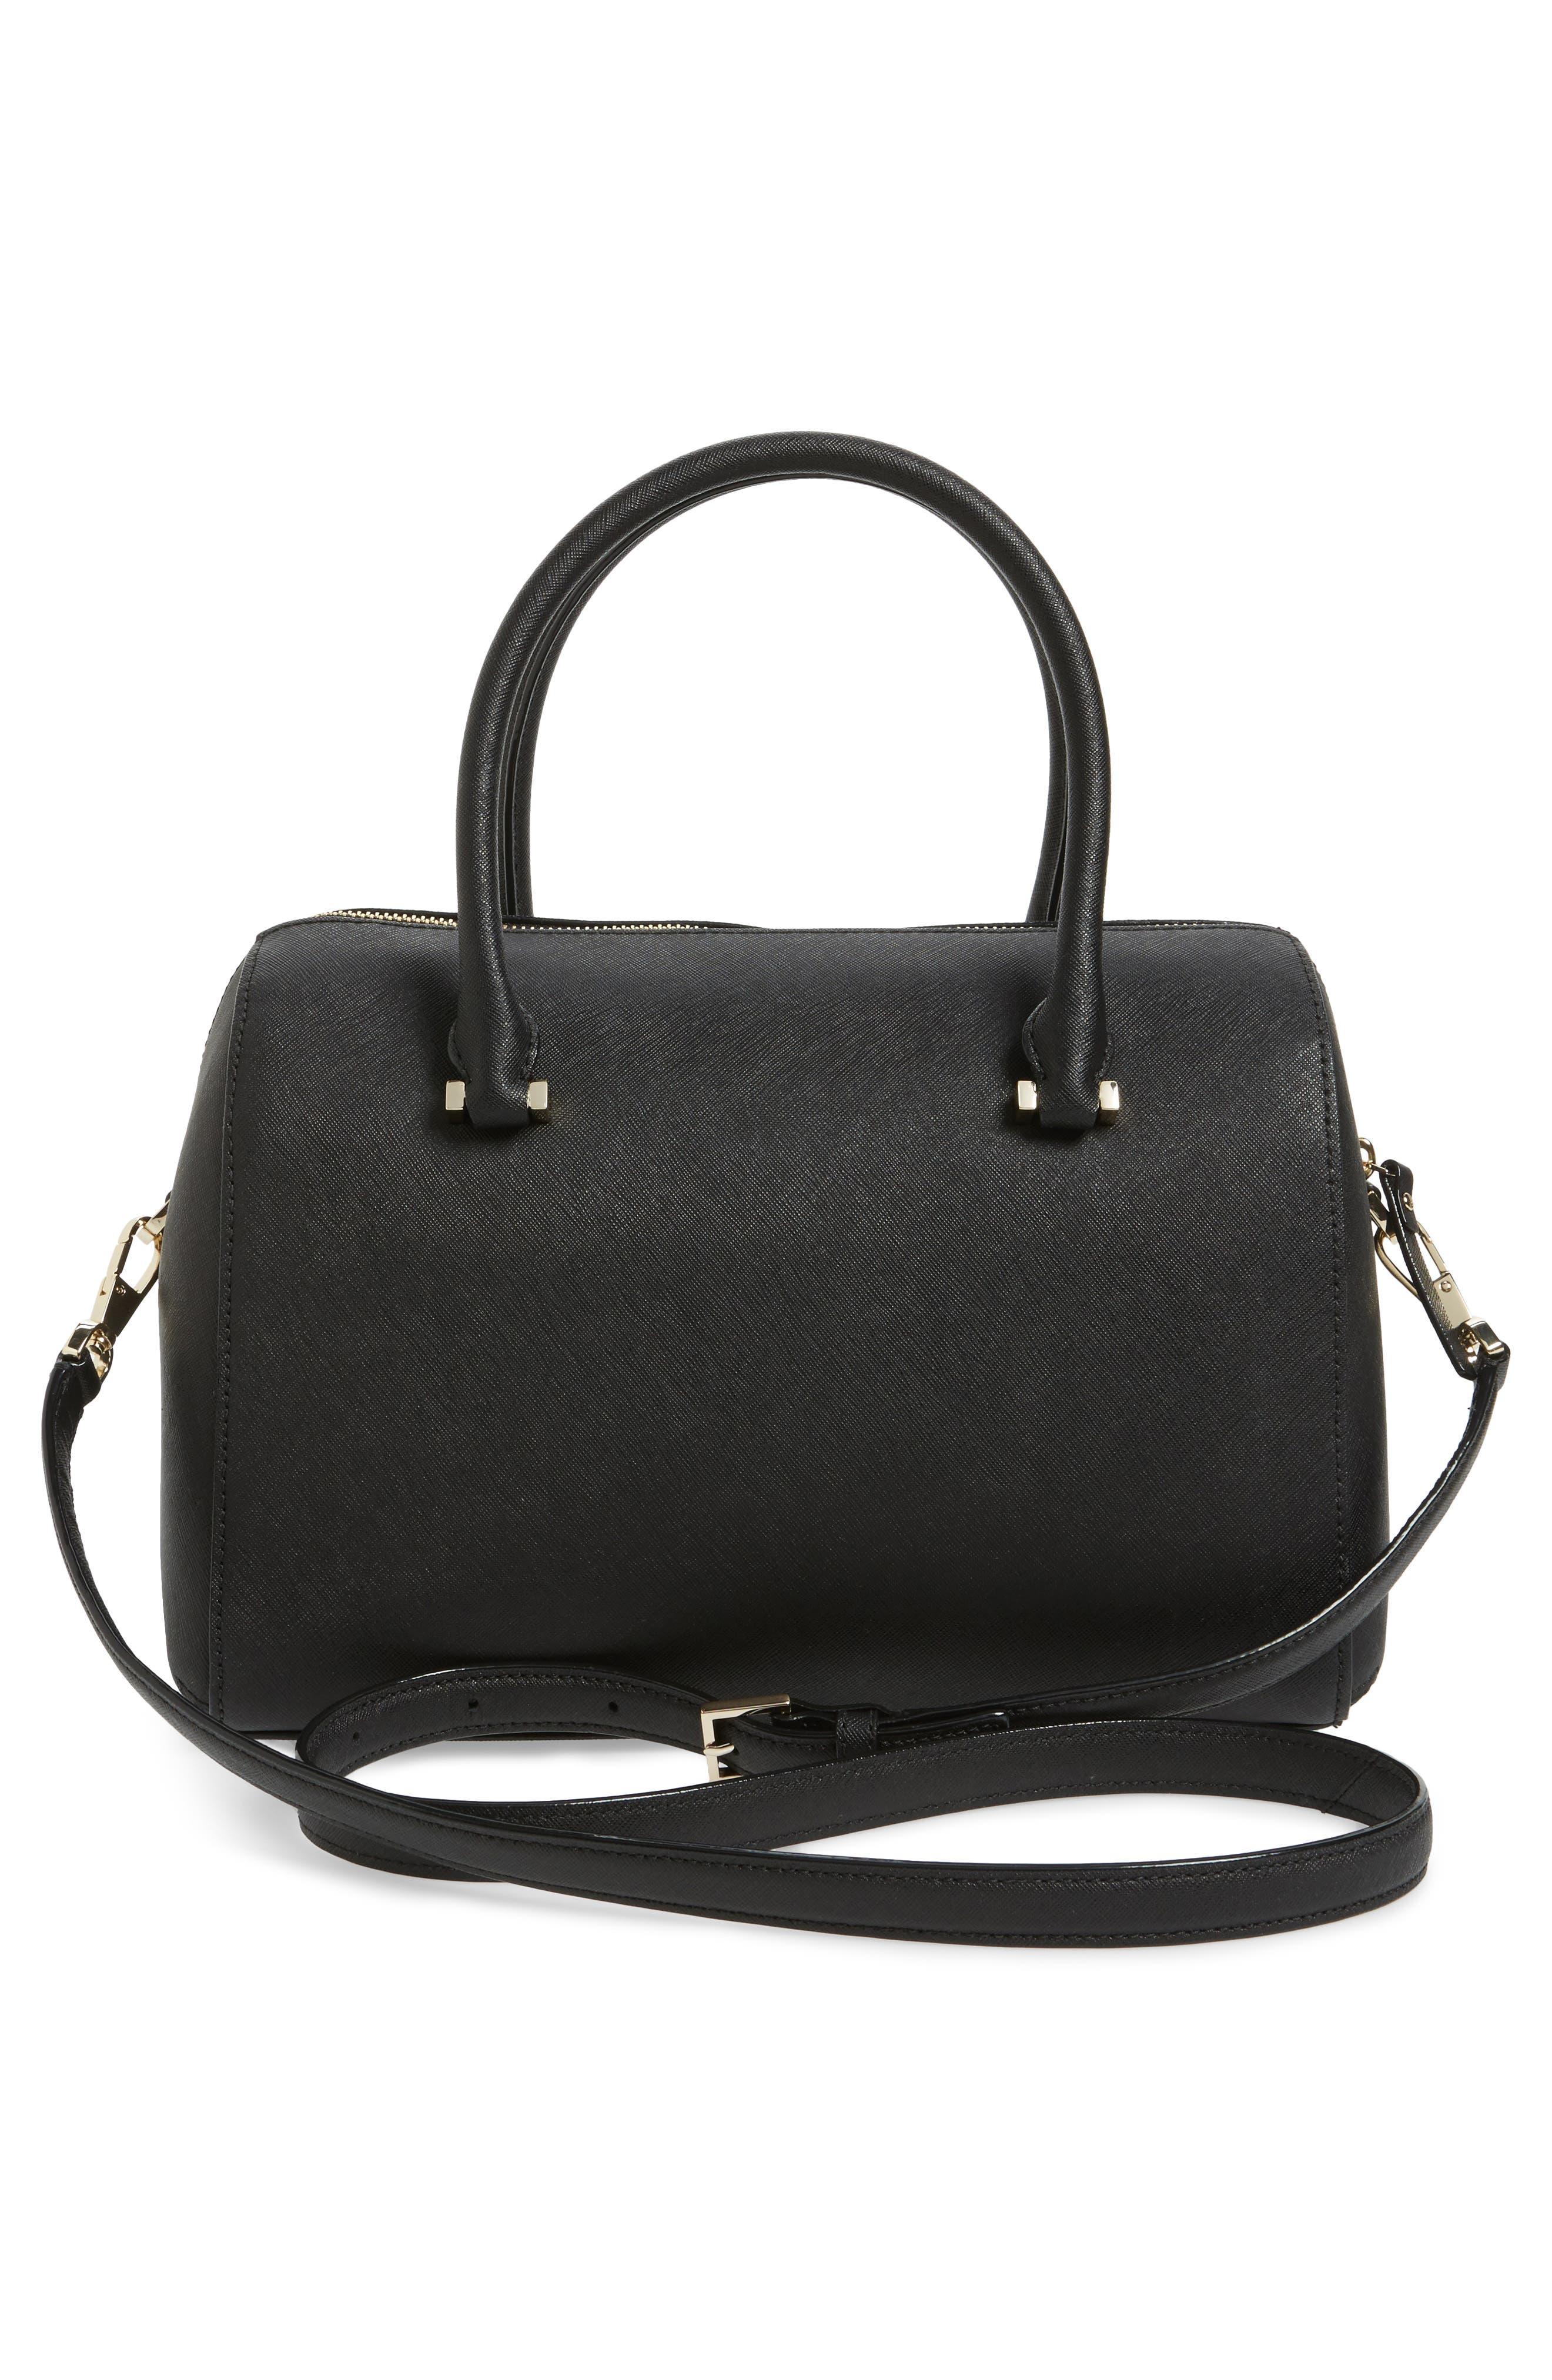 mega cameron street - lane leather satchel,                             Alternate thumbnail 2, color,                             Black